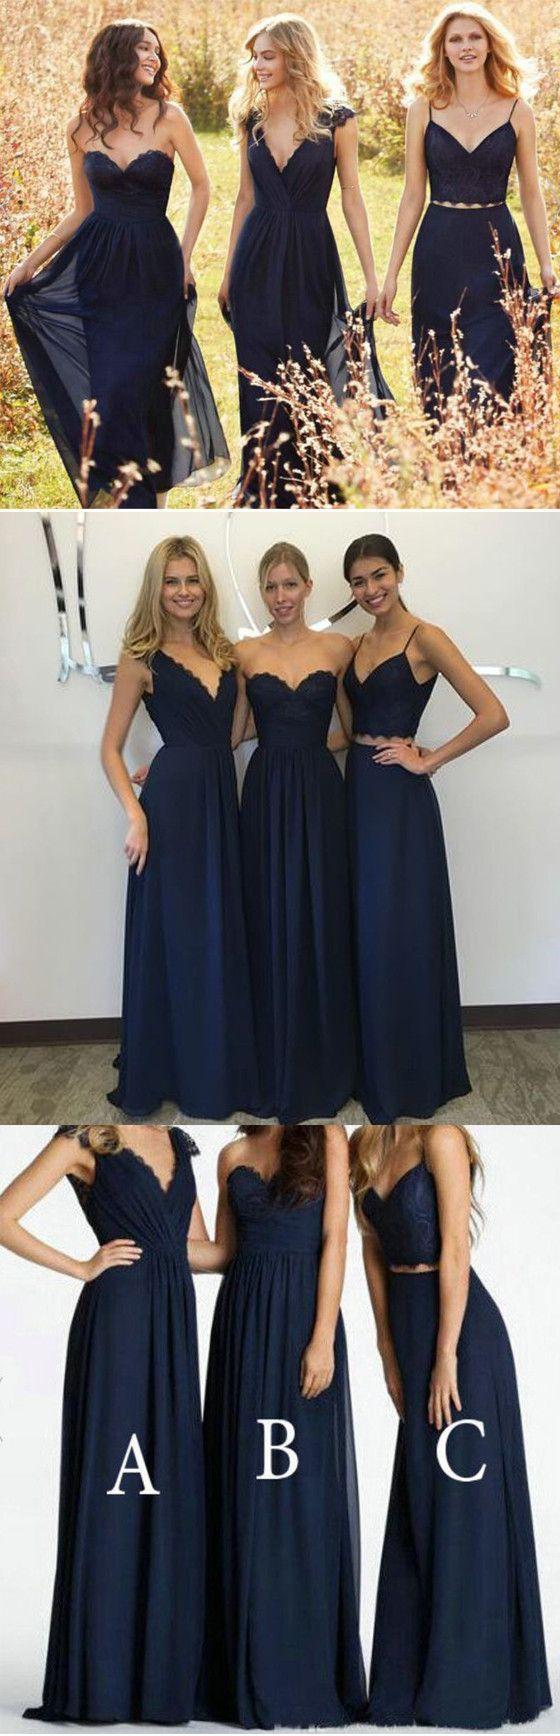 Convertible new design elegant lace chiffon navy blue a line floor